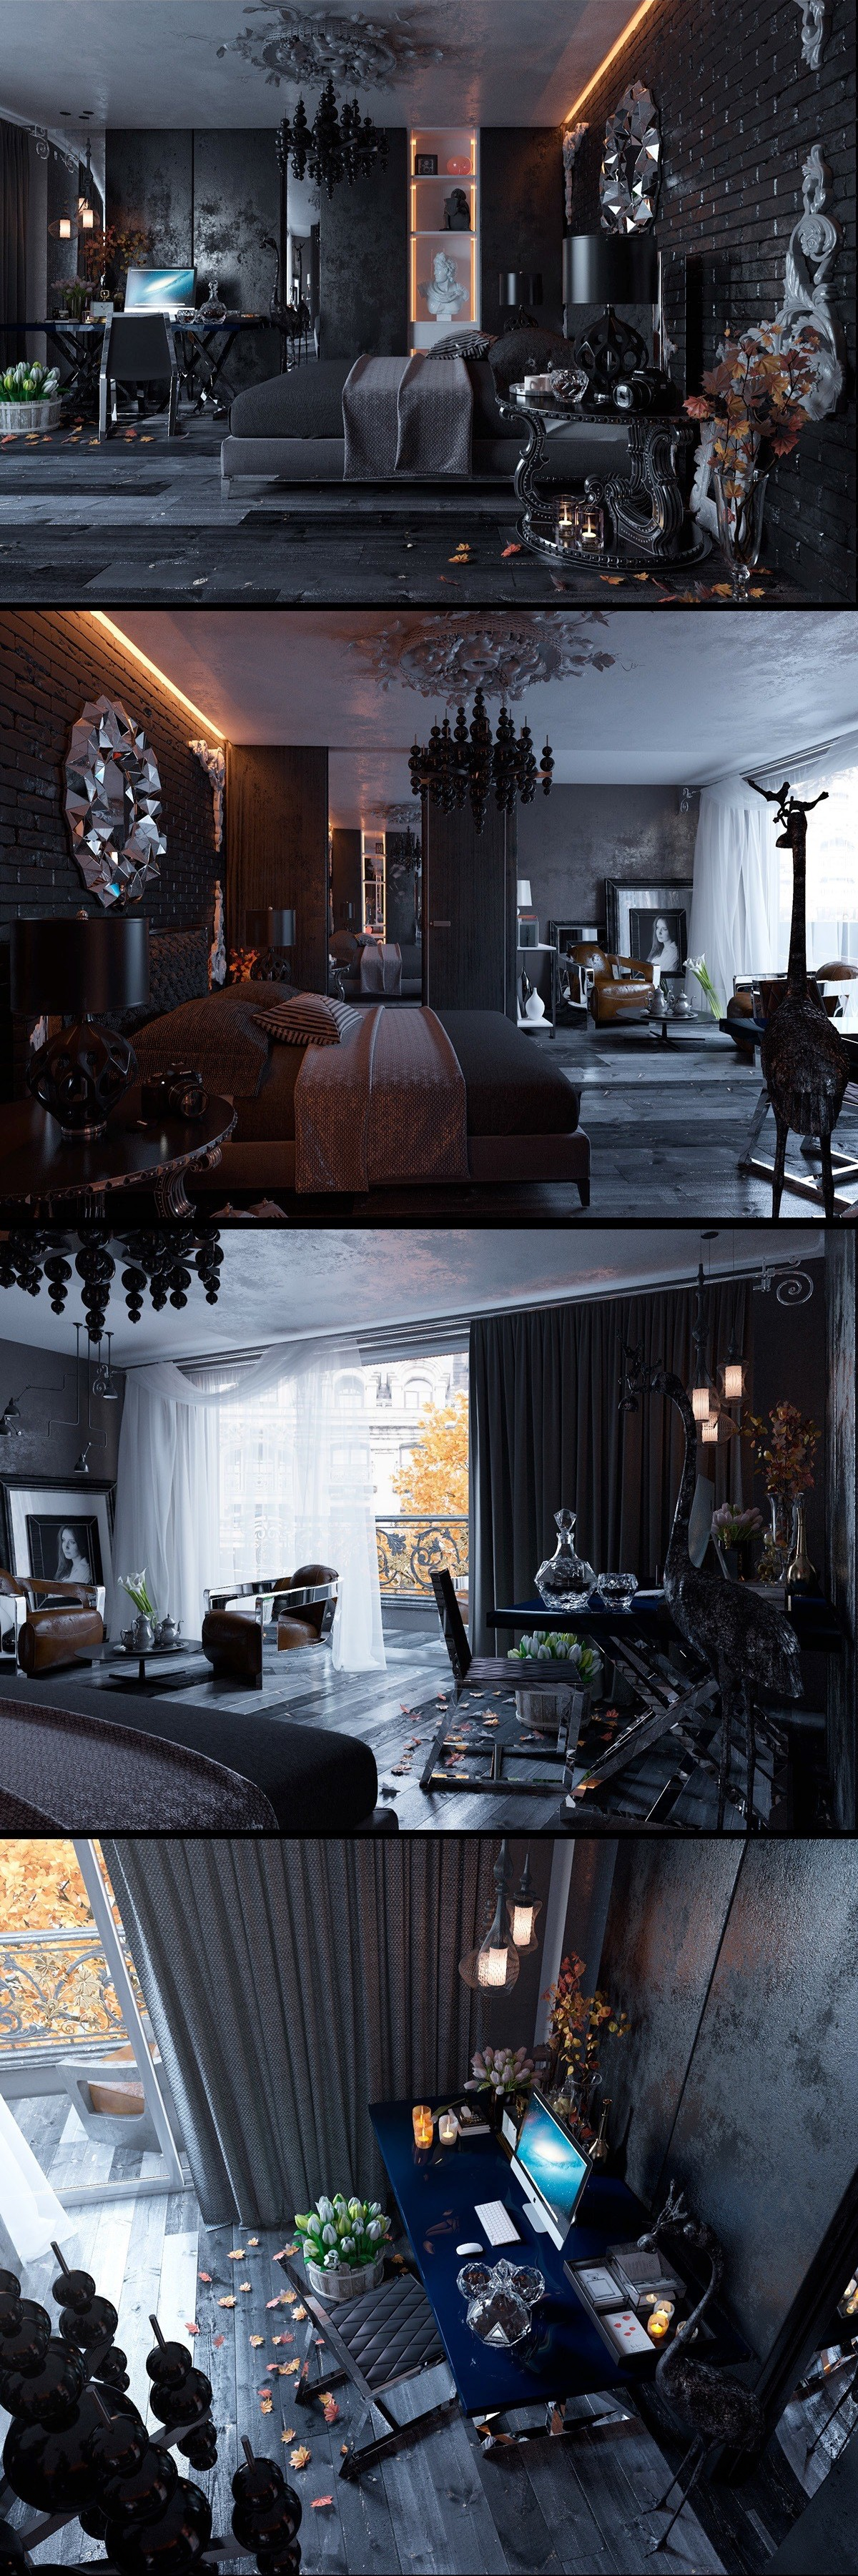 Bedroom design and decor ideas